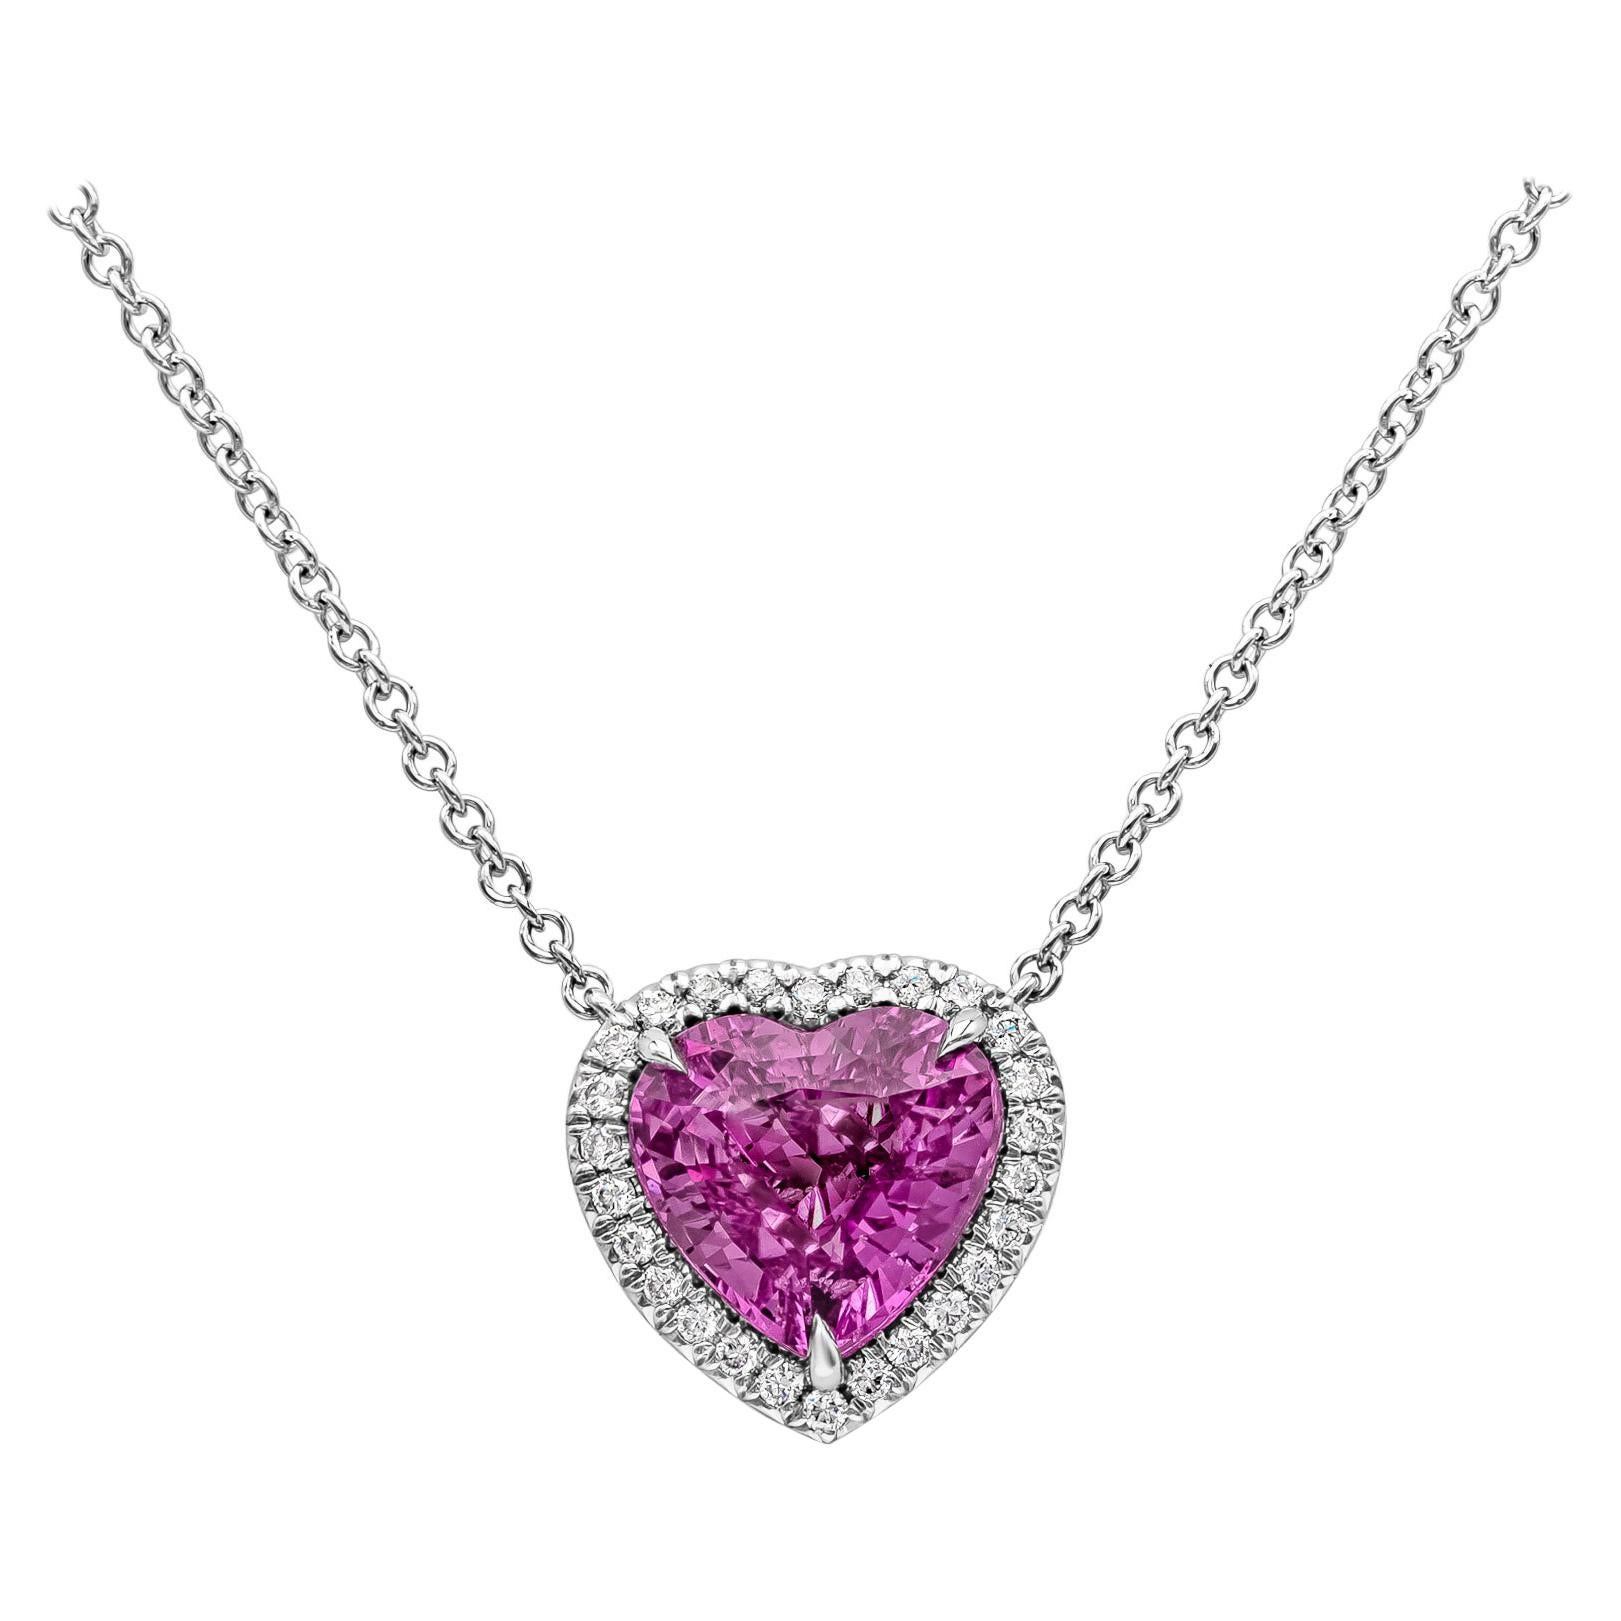 C. Dunaigre Certified Heart Pink Sapphire and Diamond Halo Pendant Necklace